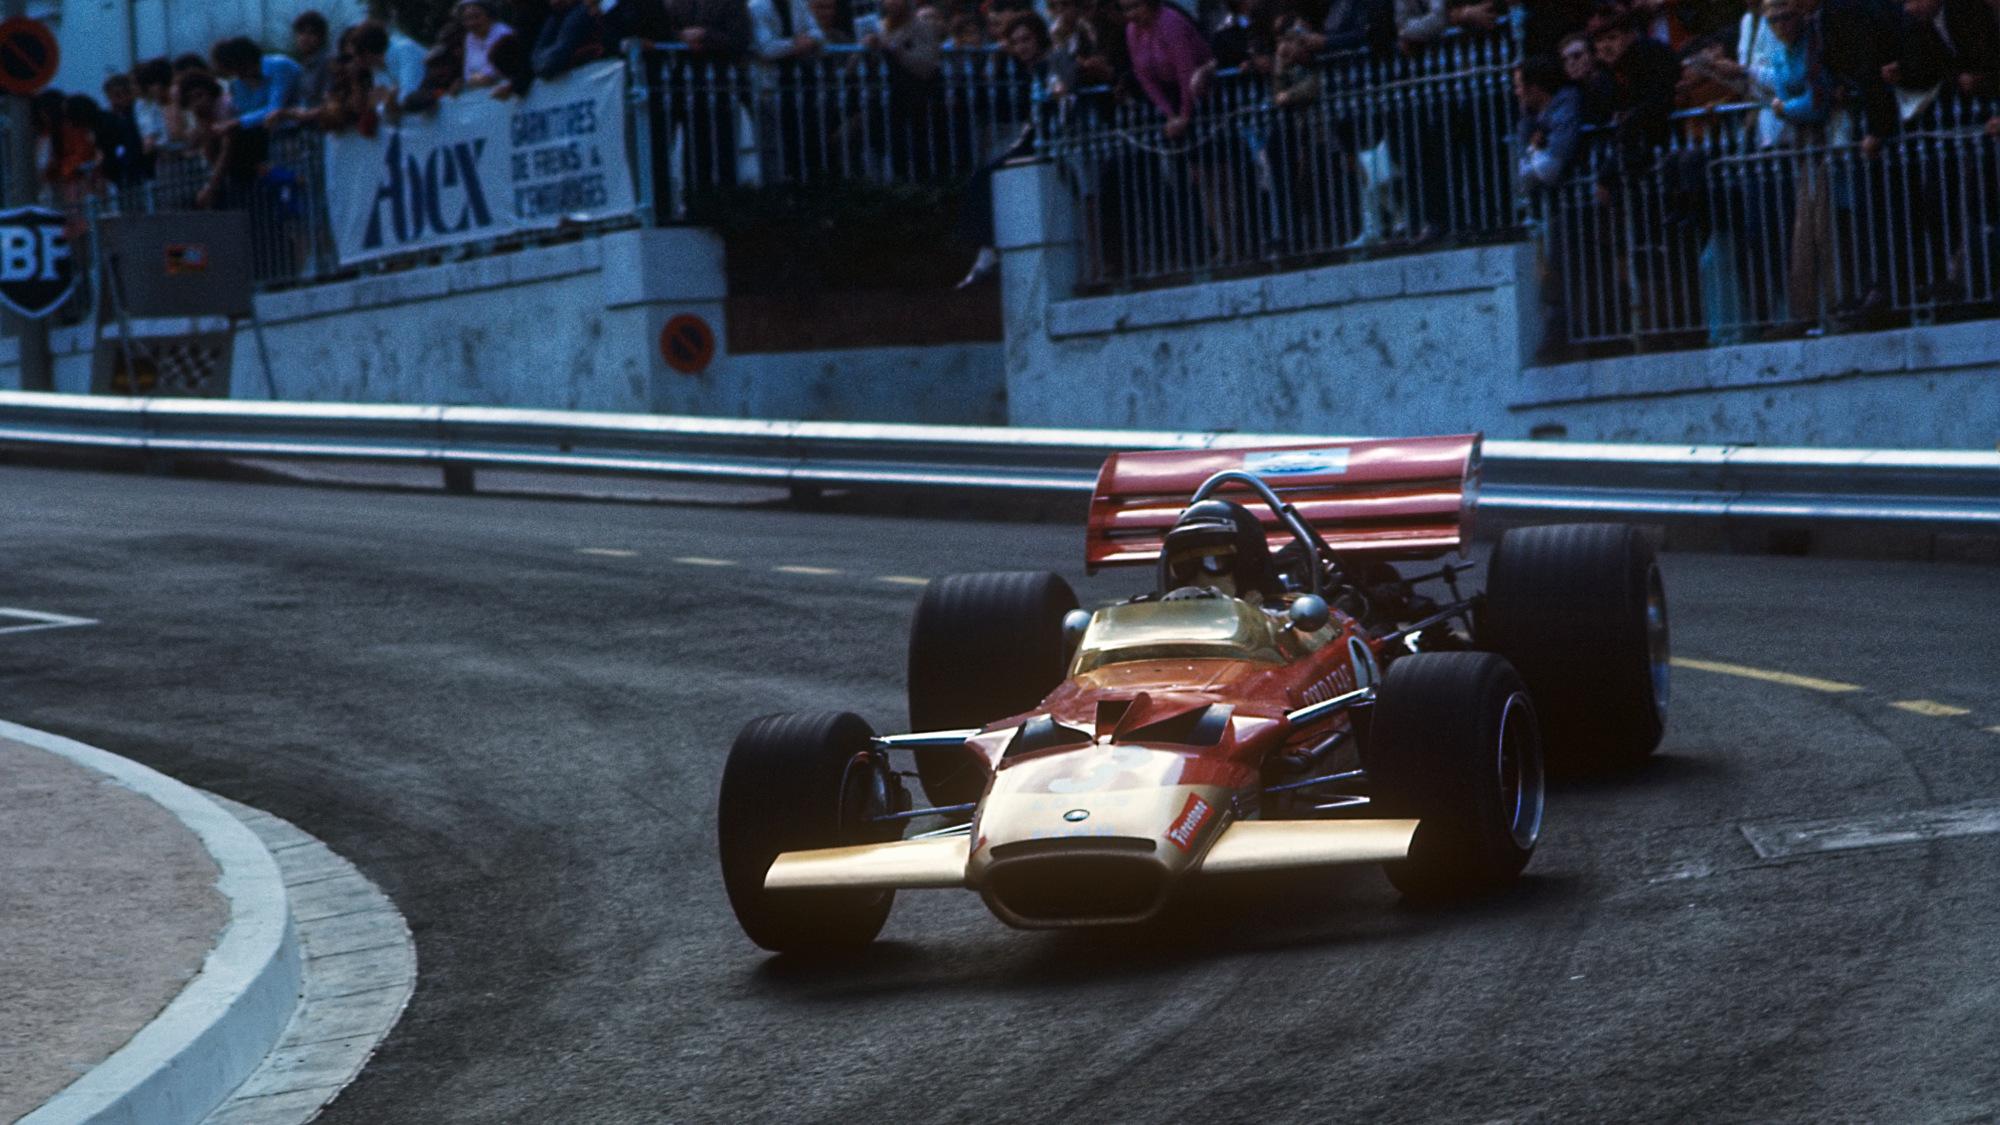 Jochen Rindt, 1970 Monaco GP